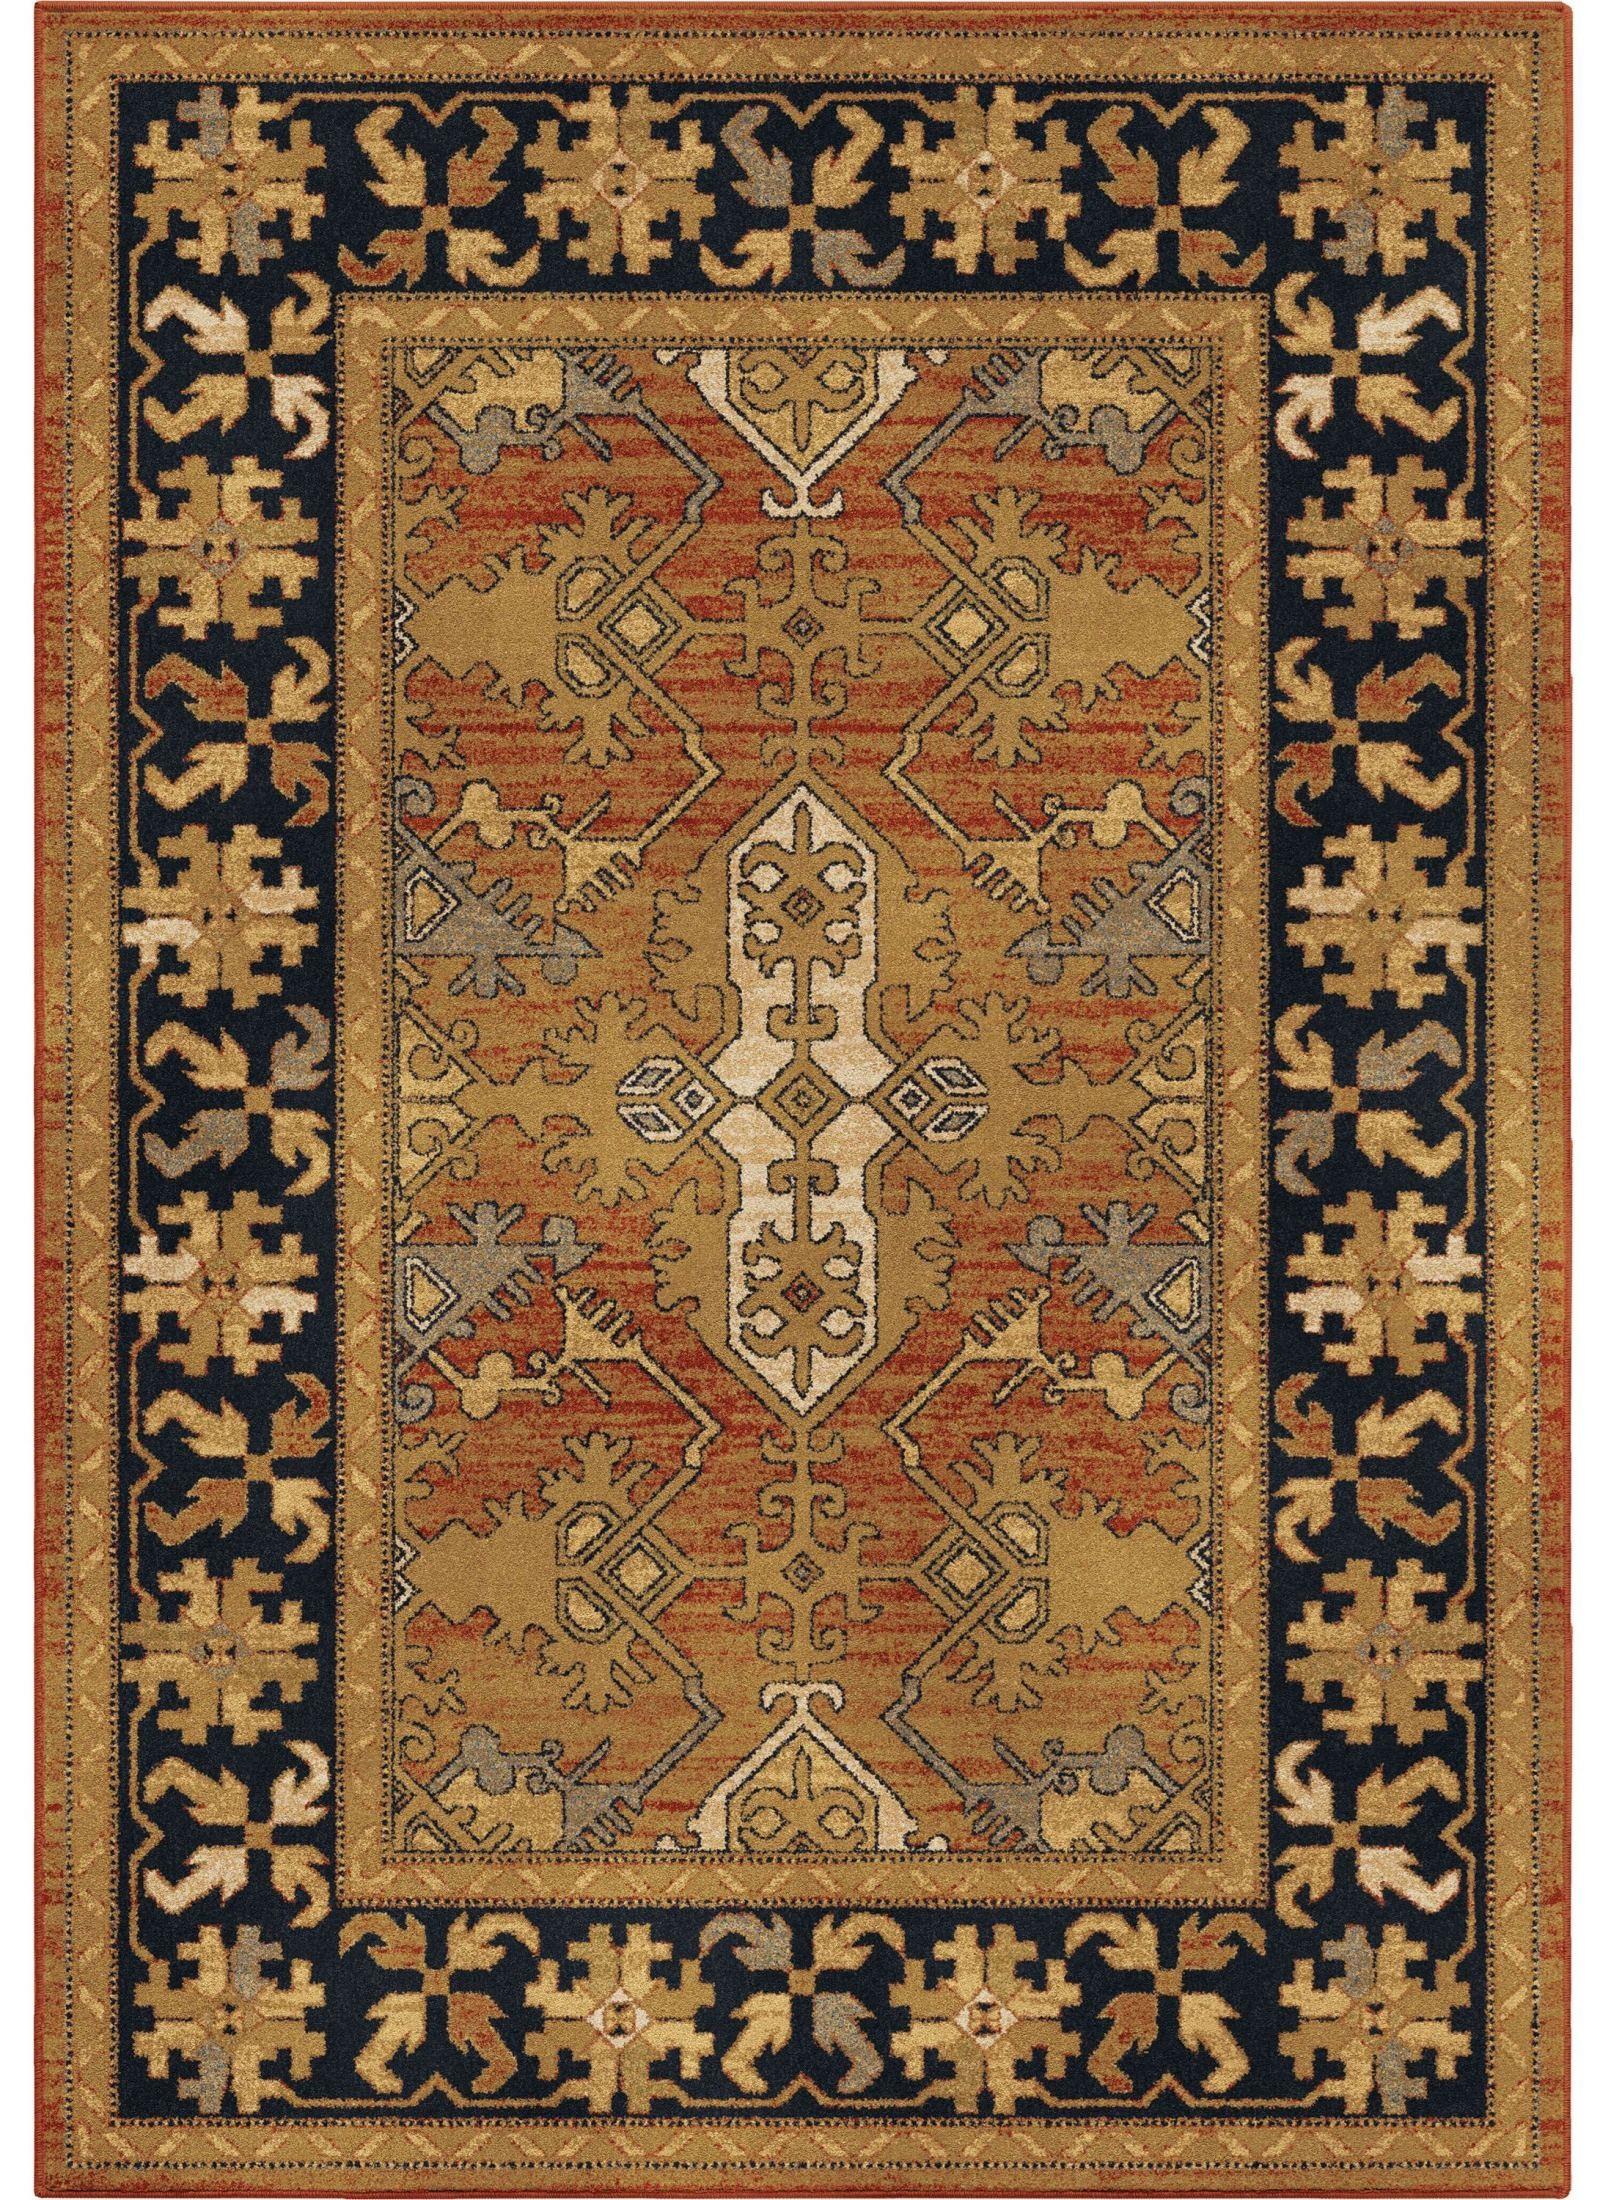 orian rugs unique coloring leaves bergama tan area large. Black Bedroom Furniture Sets. Home Design Ideas